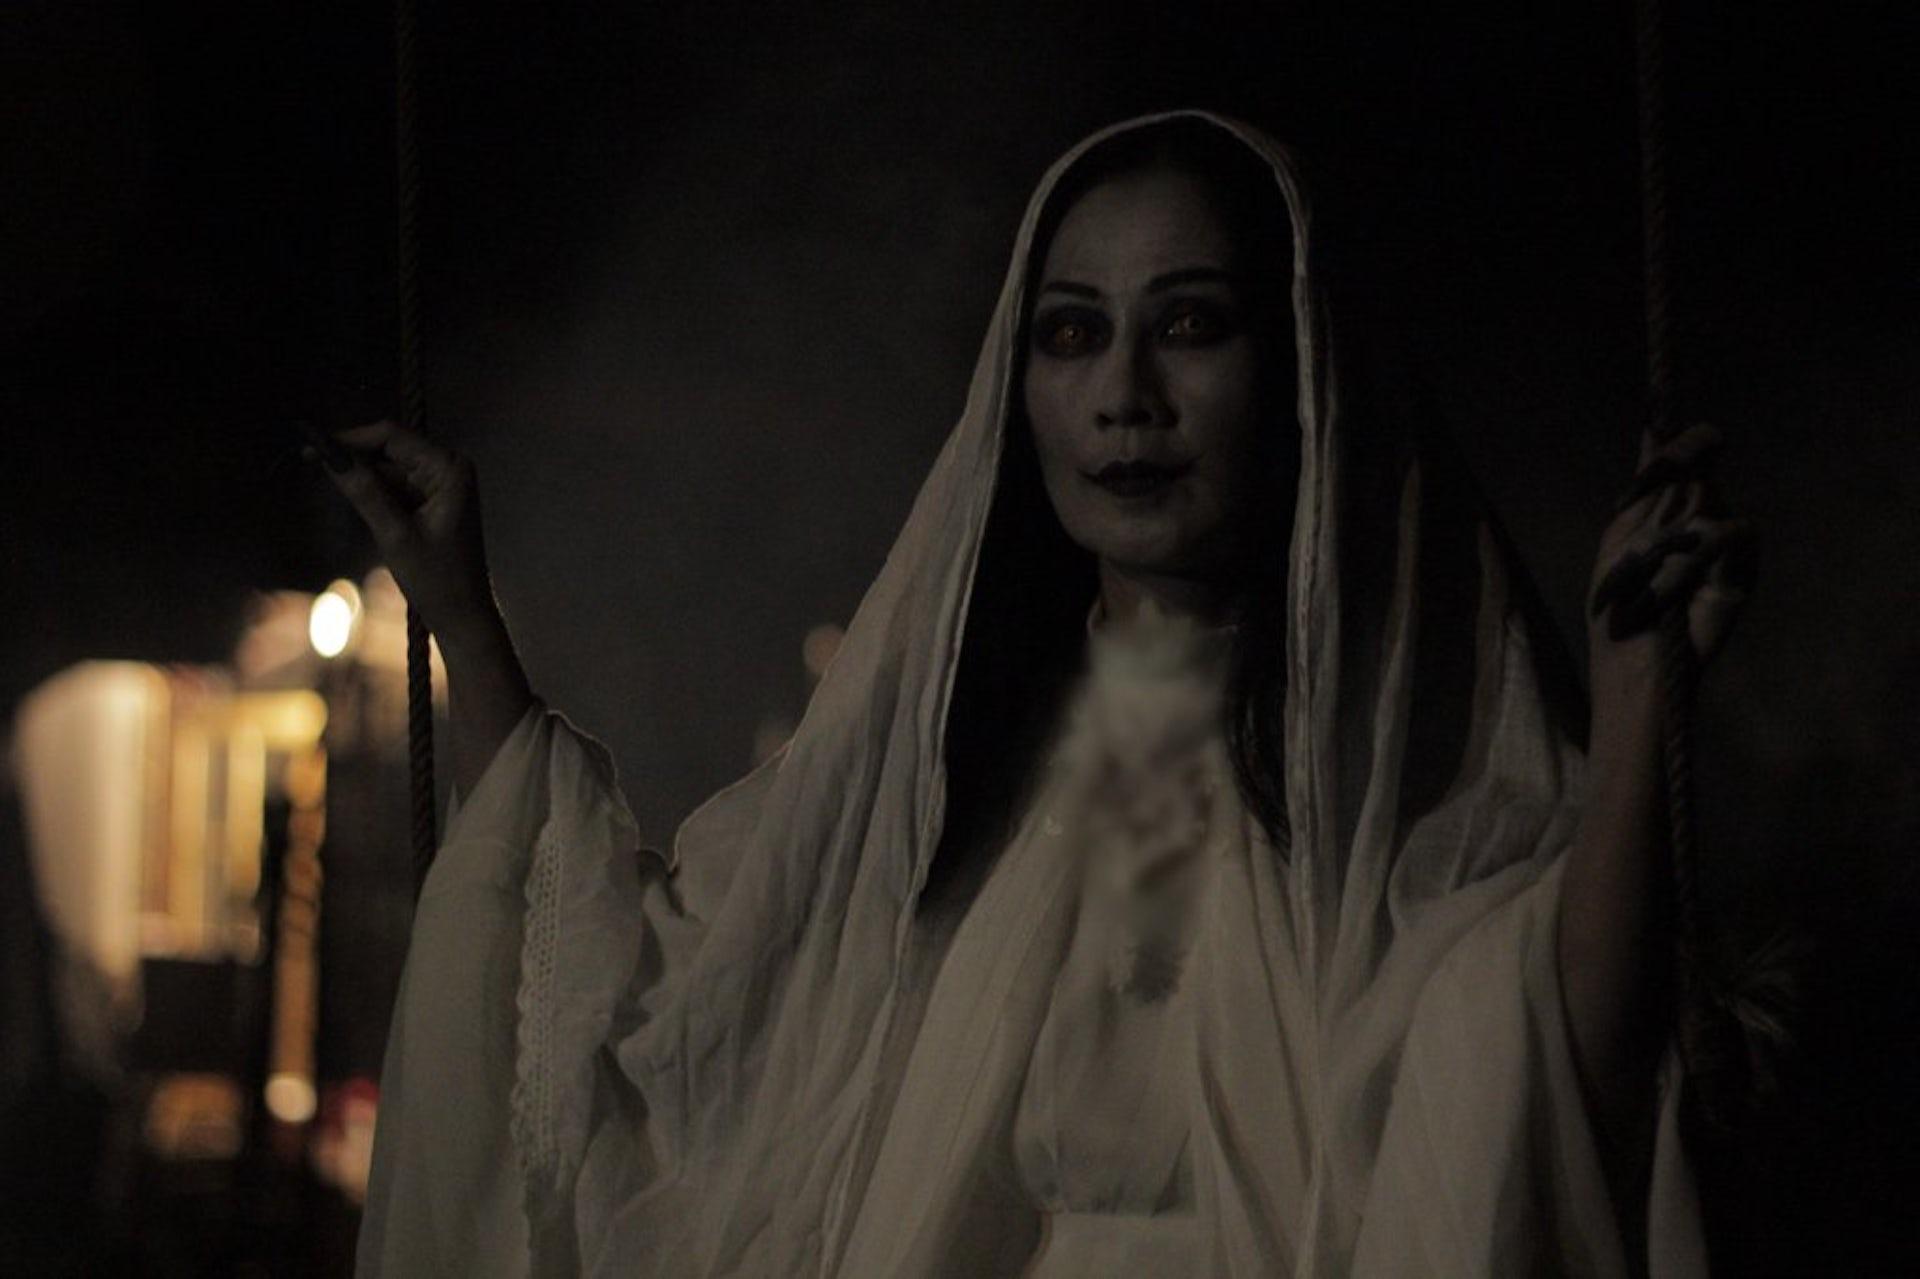 Indonesian Folklore Of Vengeful Female Ghosts Hold Symbols Of Violence Against Women